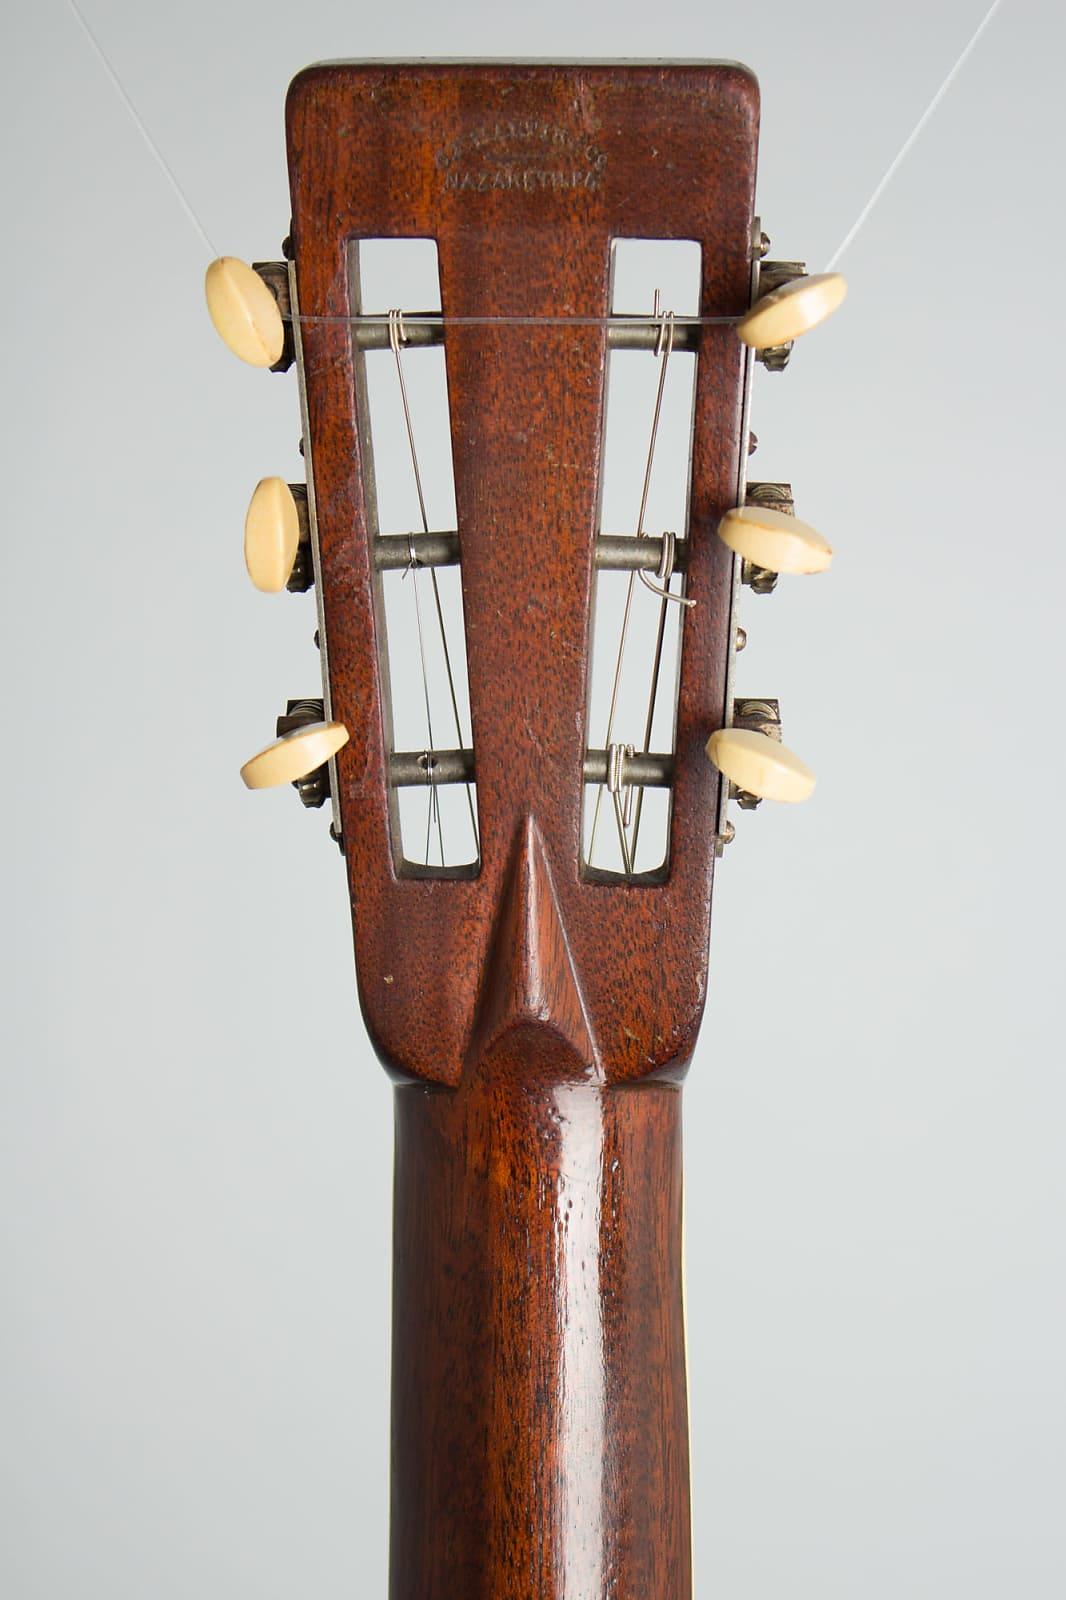 C. F. Martin  0-42 Flat Top Acoustic Guitar (1927), ser. #33279, black hard shell case.